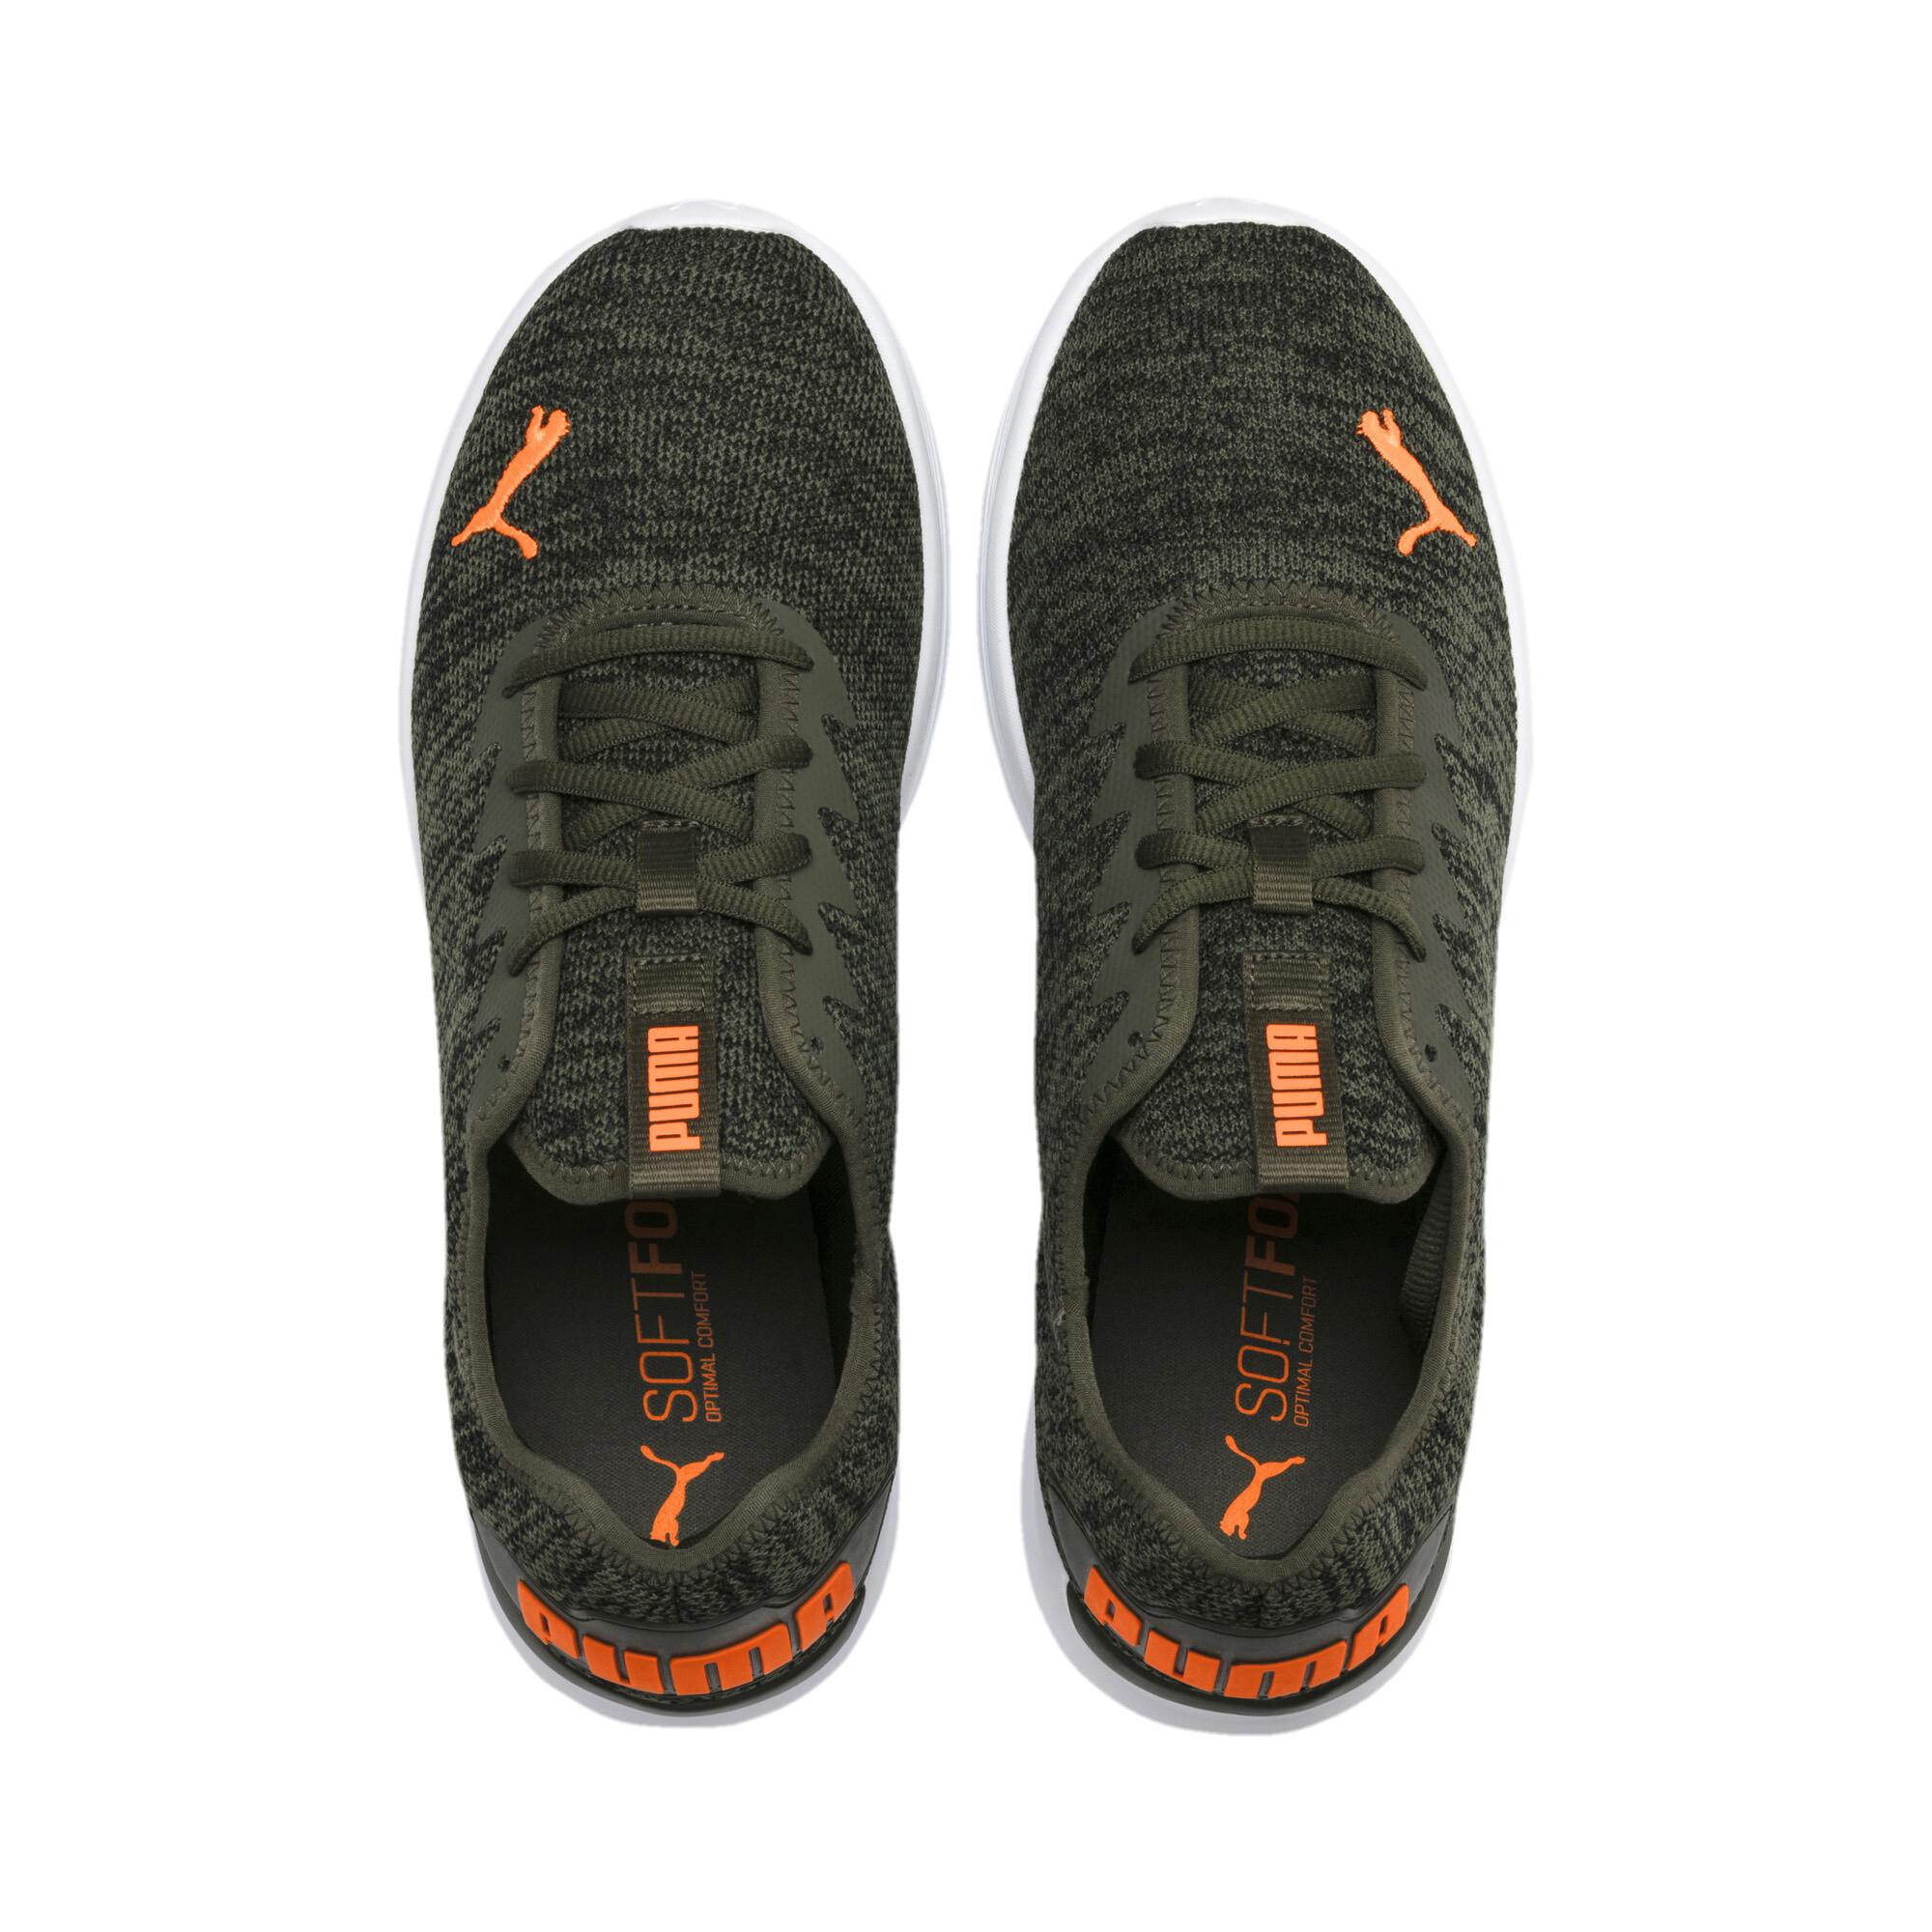 PUMA-Ballast-Men-039-s-Running-Shoes-Men-Shoe-Running thumbnail 8